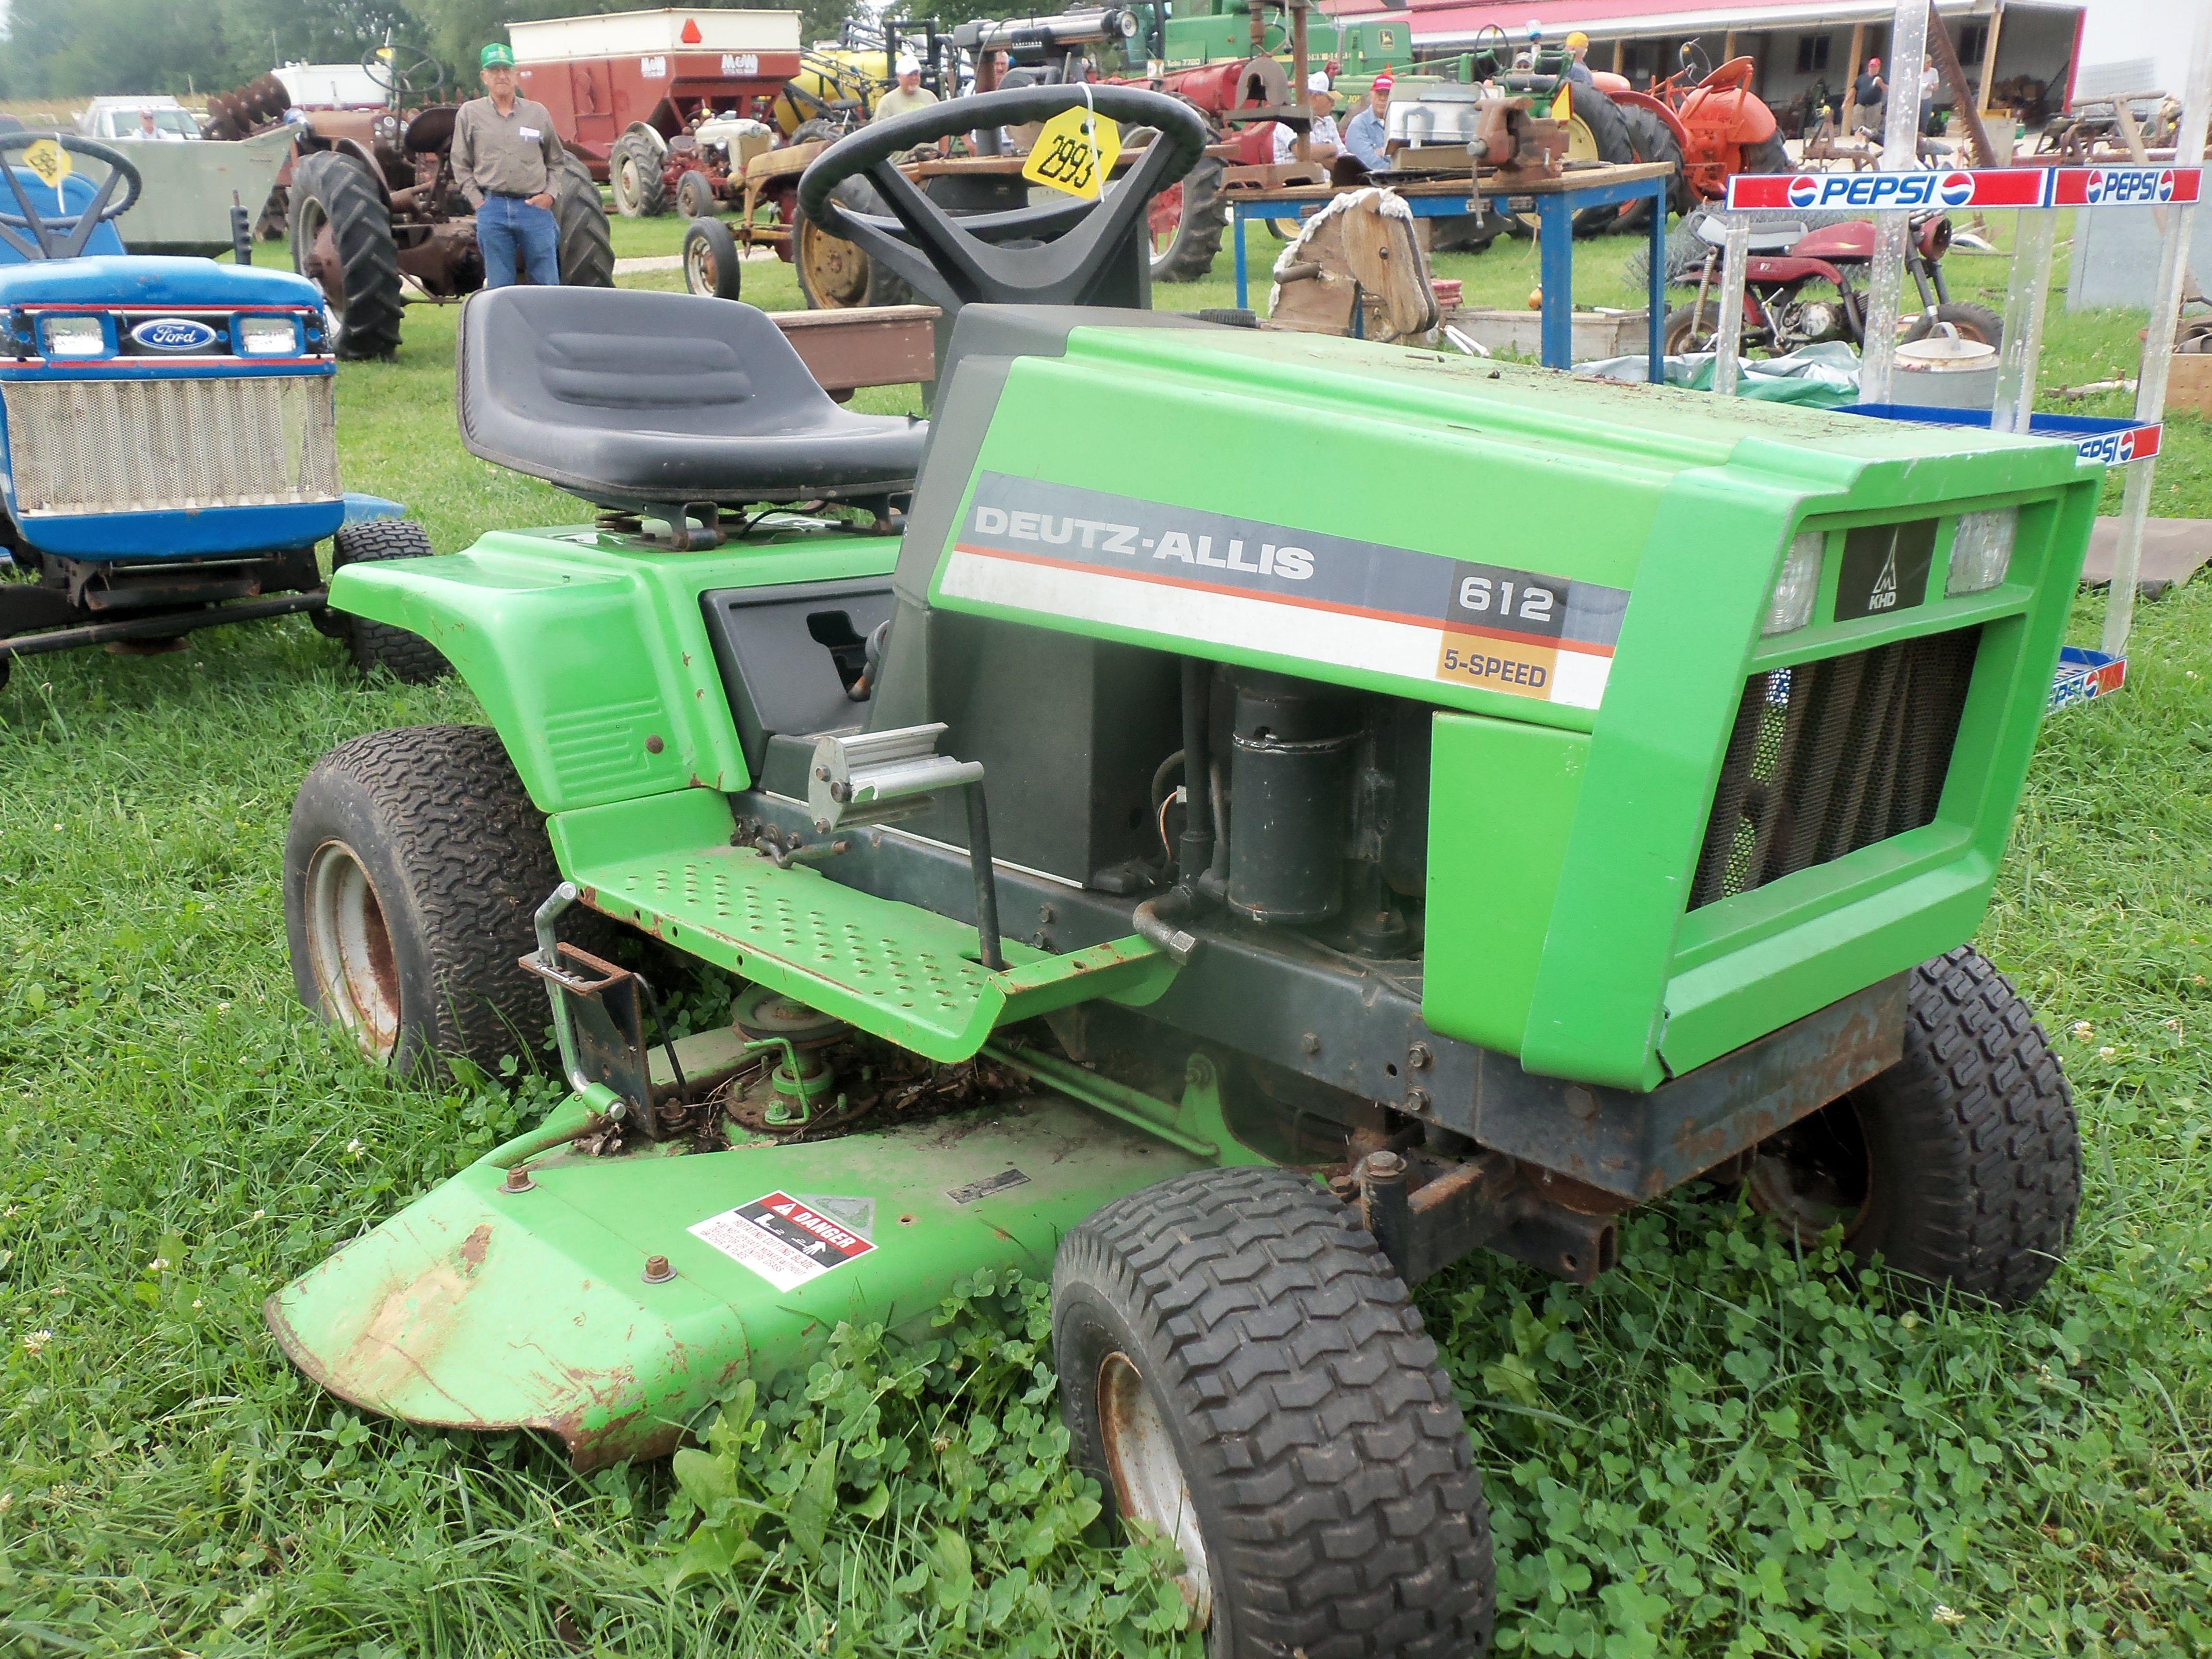 12hp Deutz Allis 612 Lawn Tractor